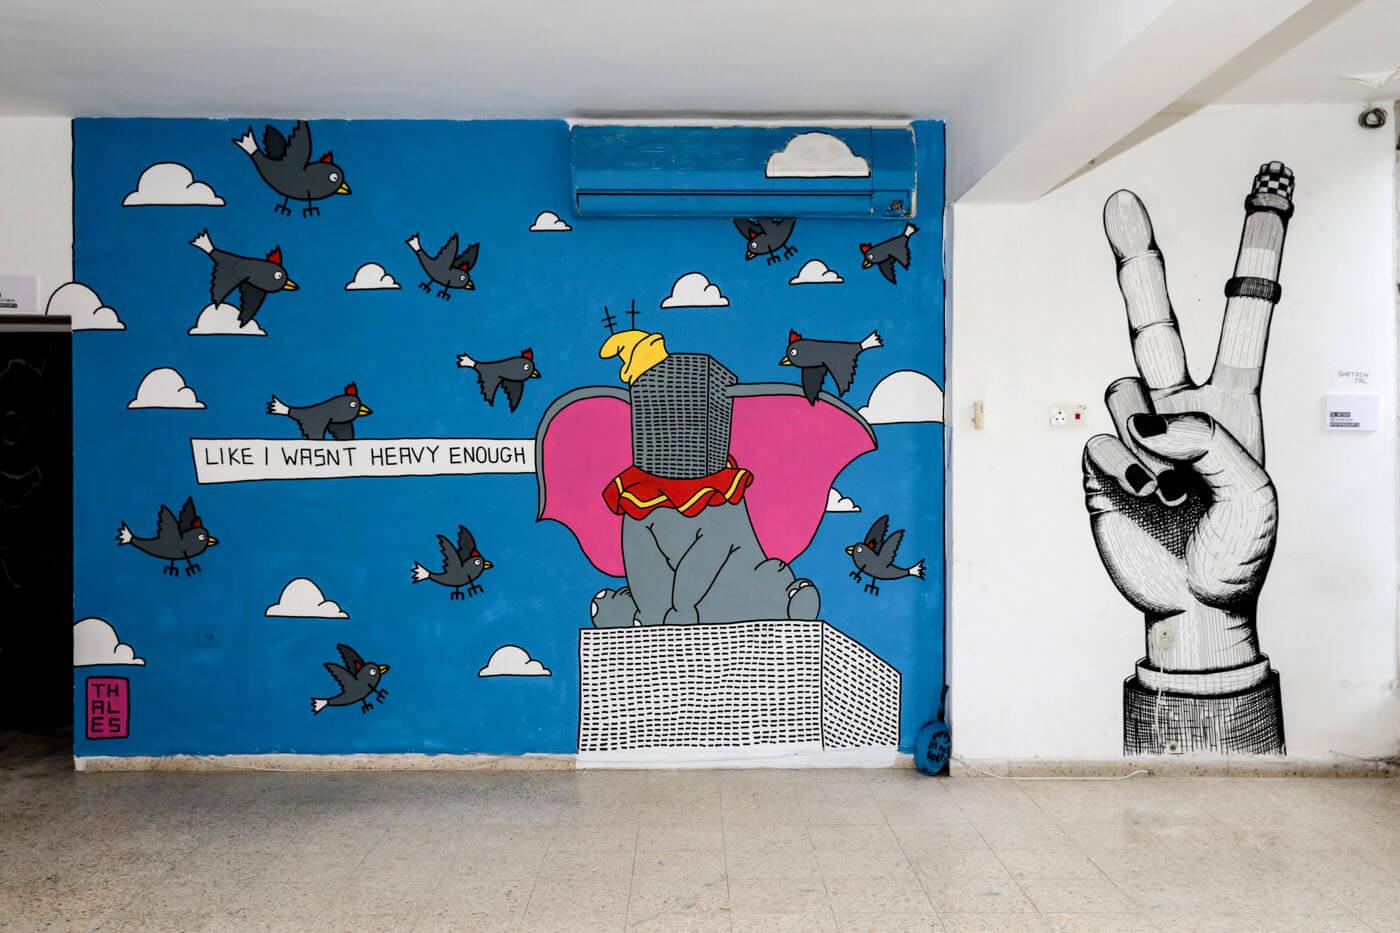 THALES+Tal Shetach_מתוך מוזיאון פופ אפ תל אביב_קרדיט צילום גילי לוינסון